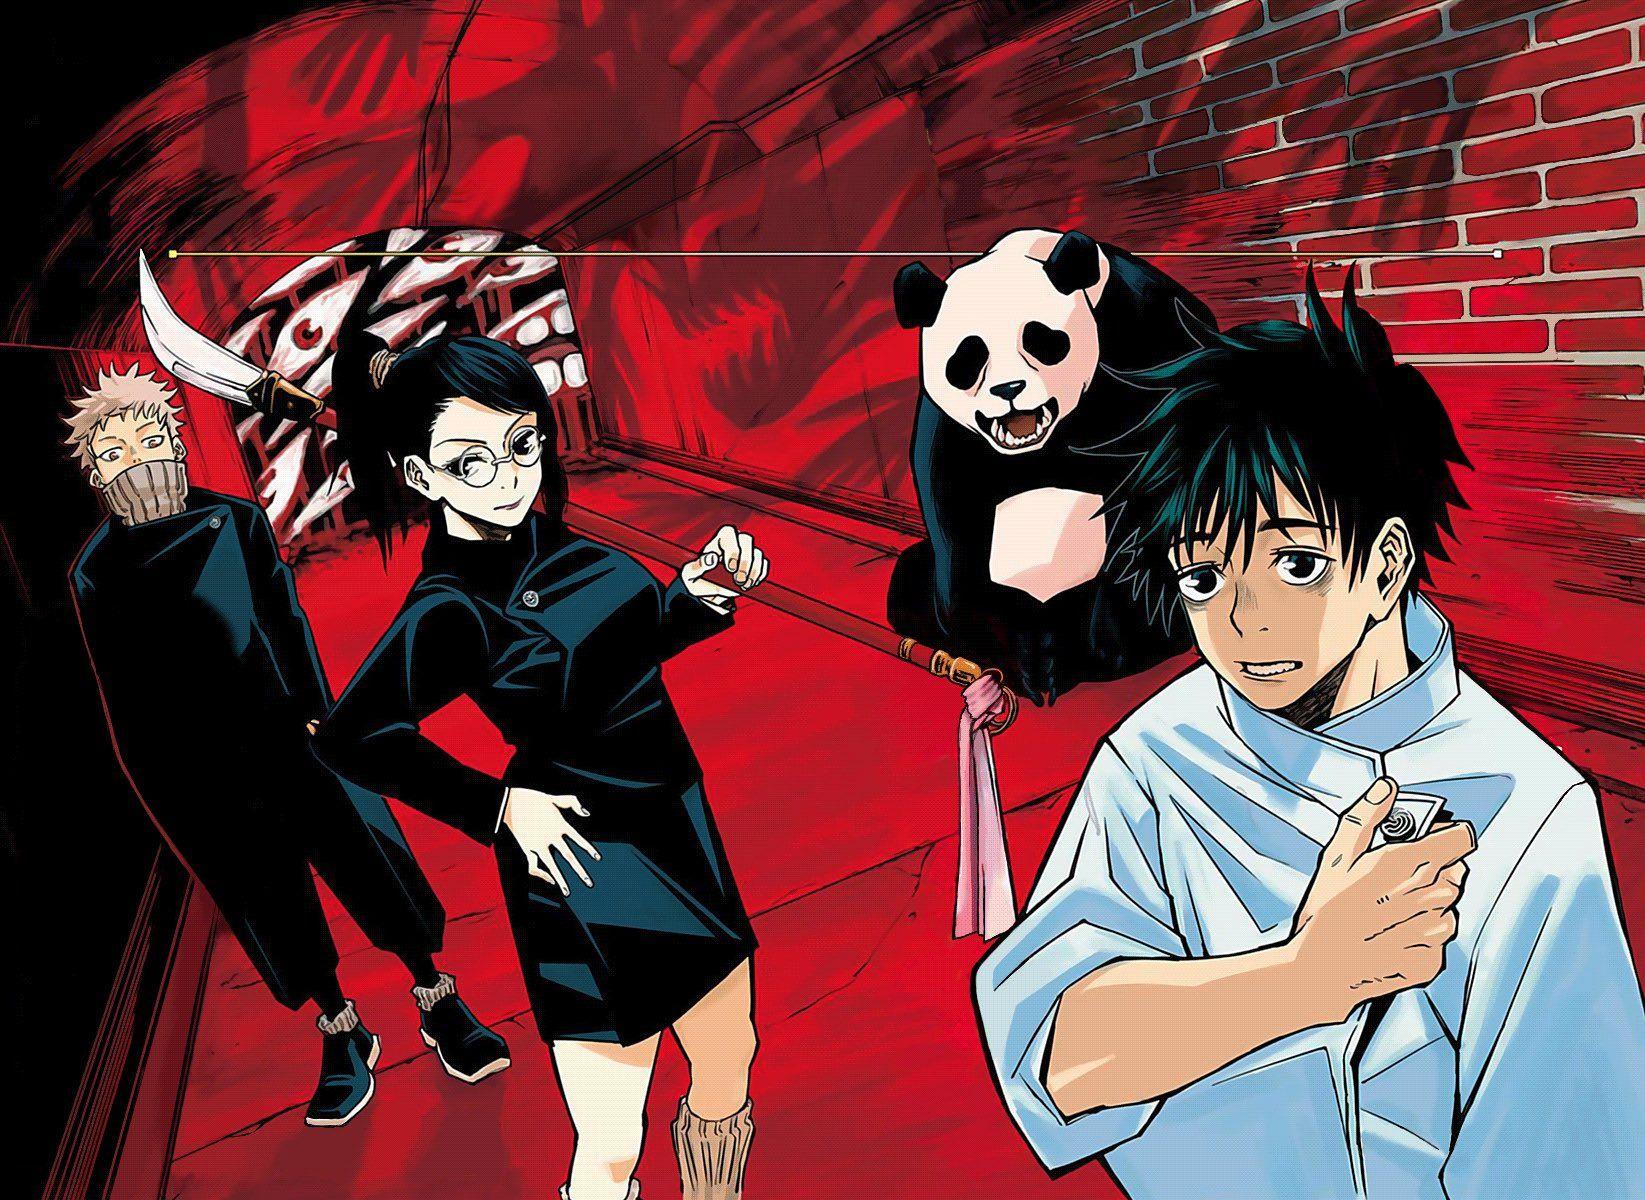 Jujutsu Kaisen On Twitter In 2021 Jujutsu Anime Manga Anime